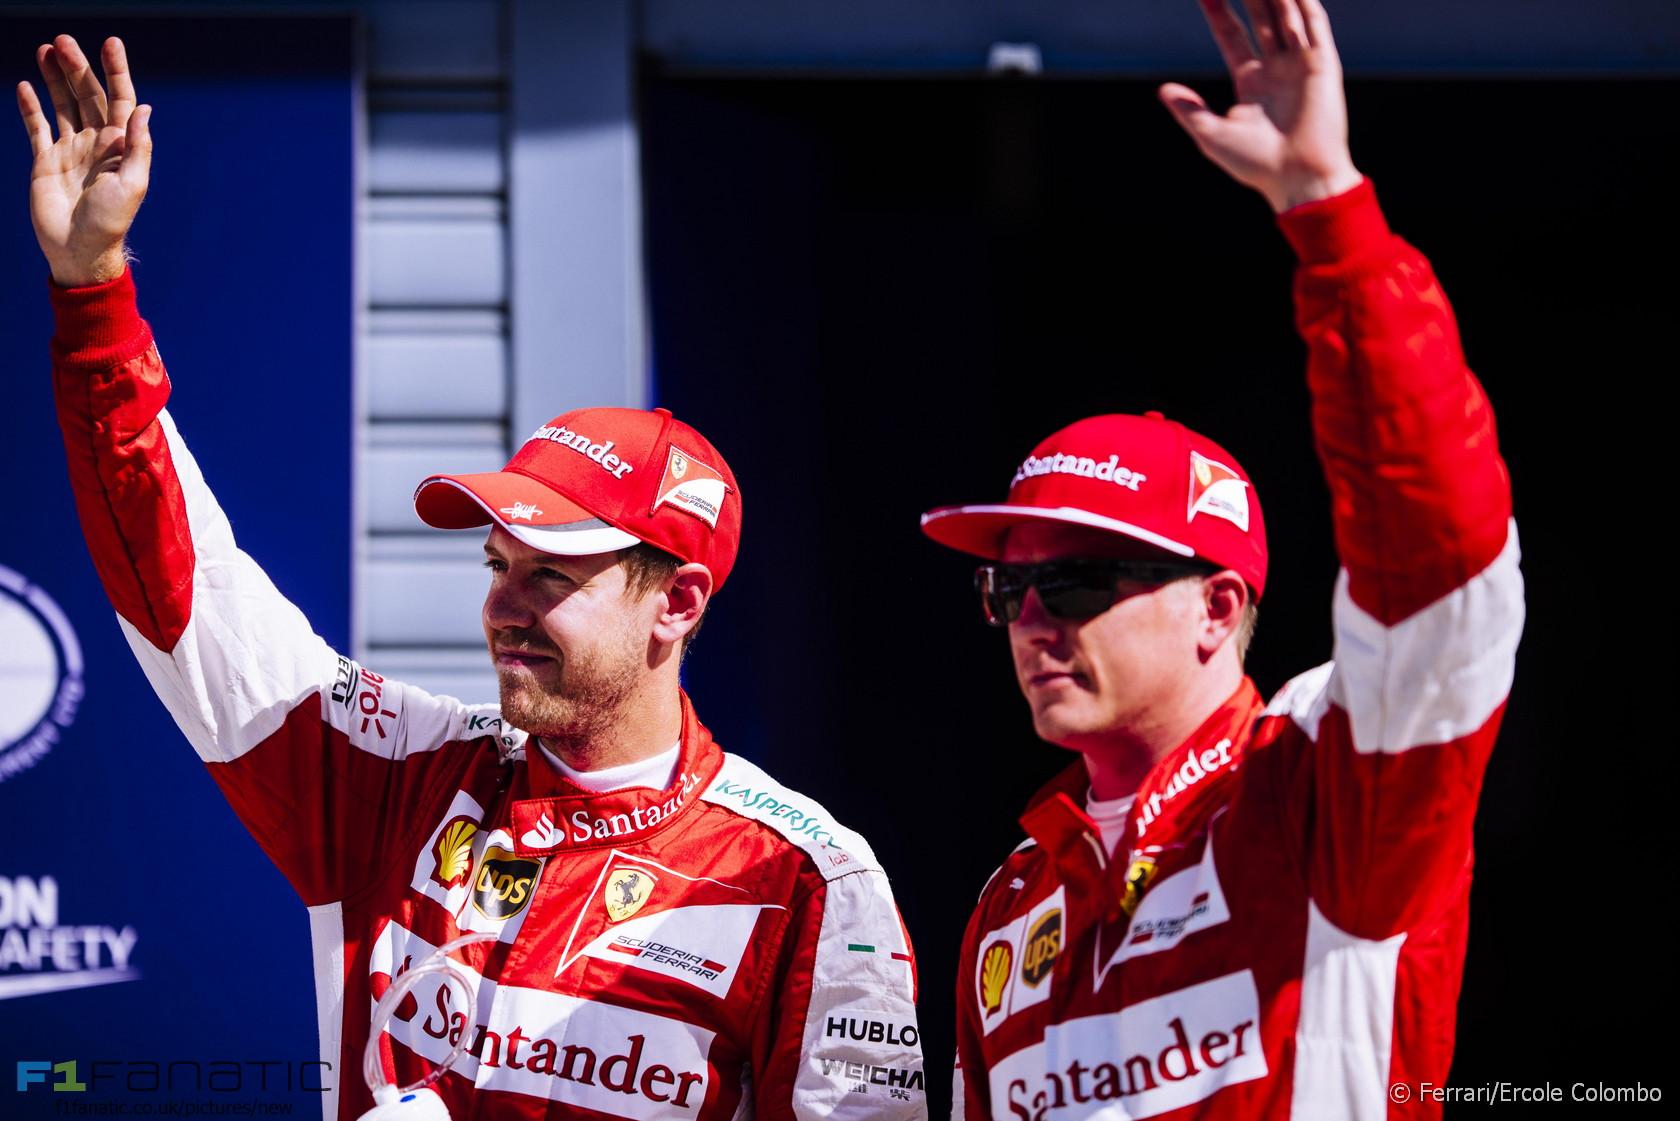 Sebastian Vettel, Kimi Raikkonen, Ferrari, Monza, 2015